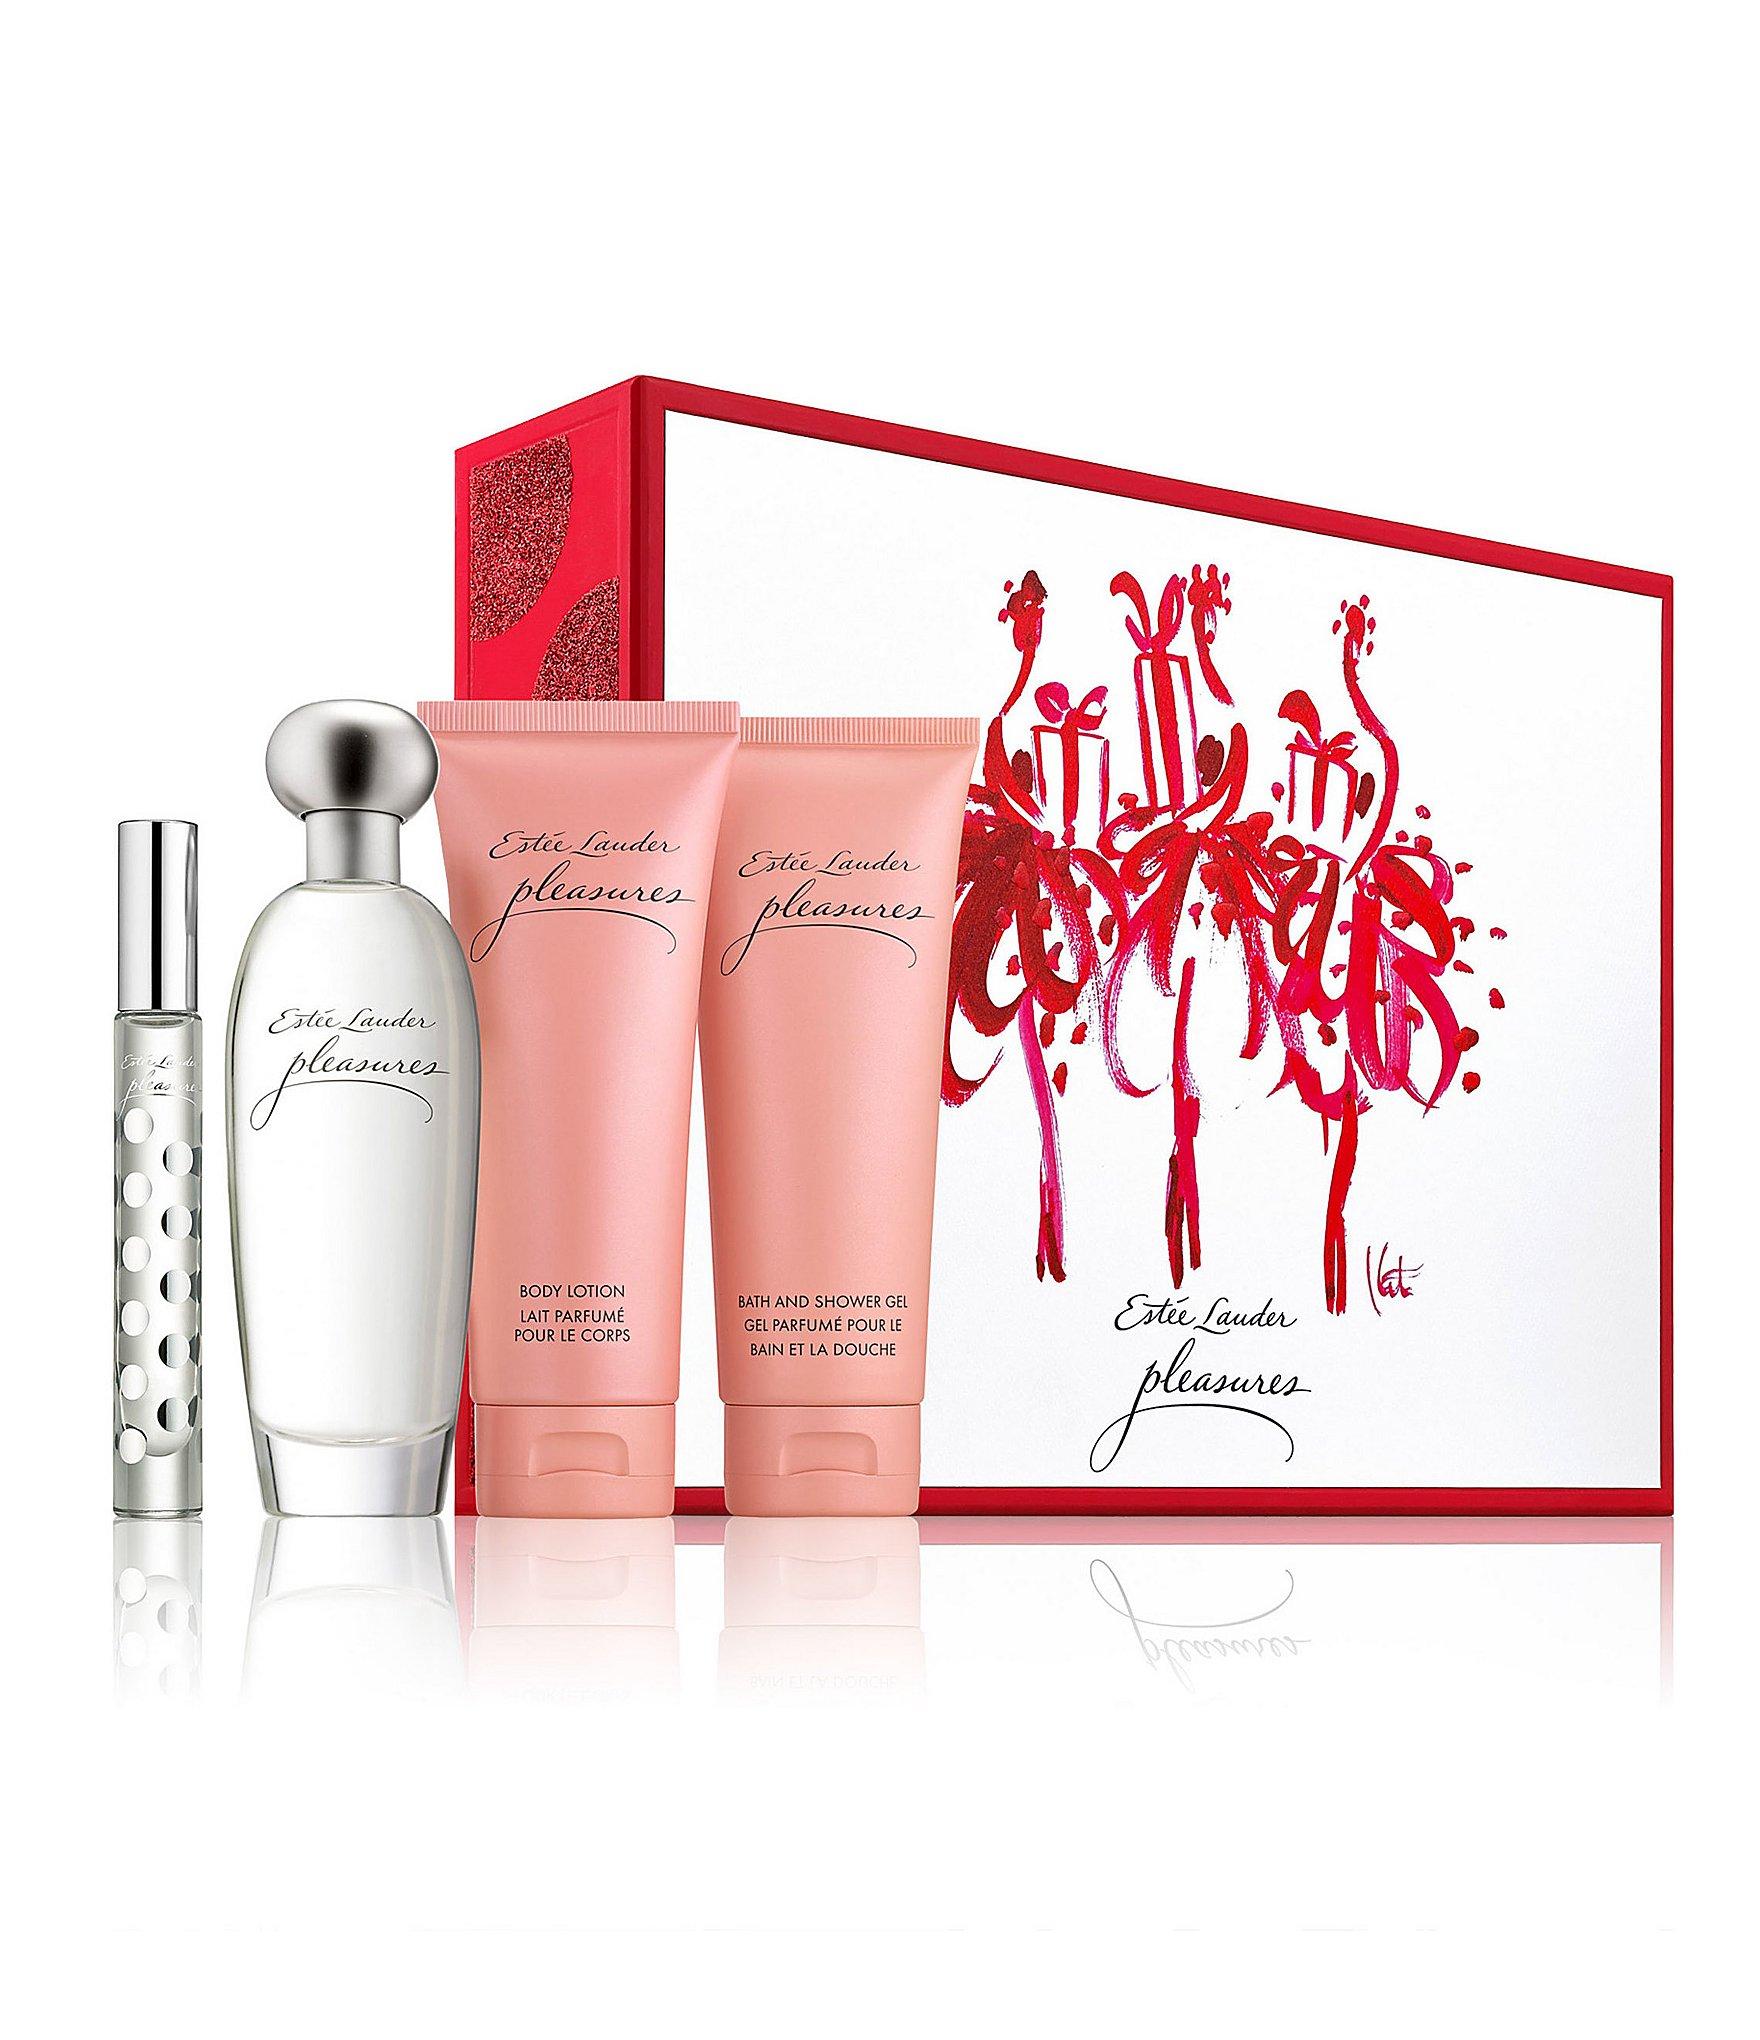 Estee Lauder Pleasures Favorite Destination Gift Set | Dillards